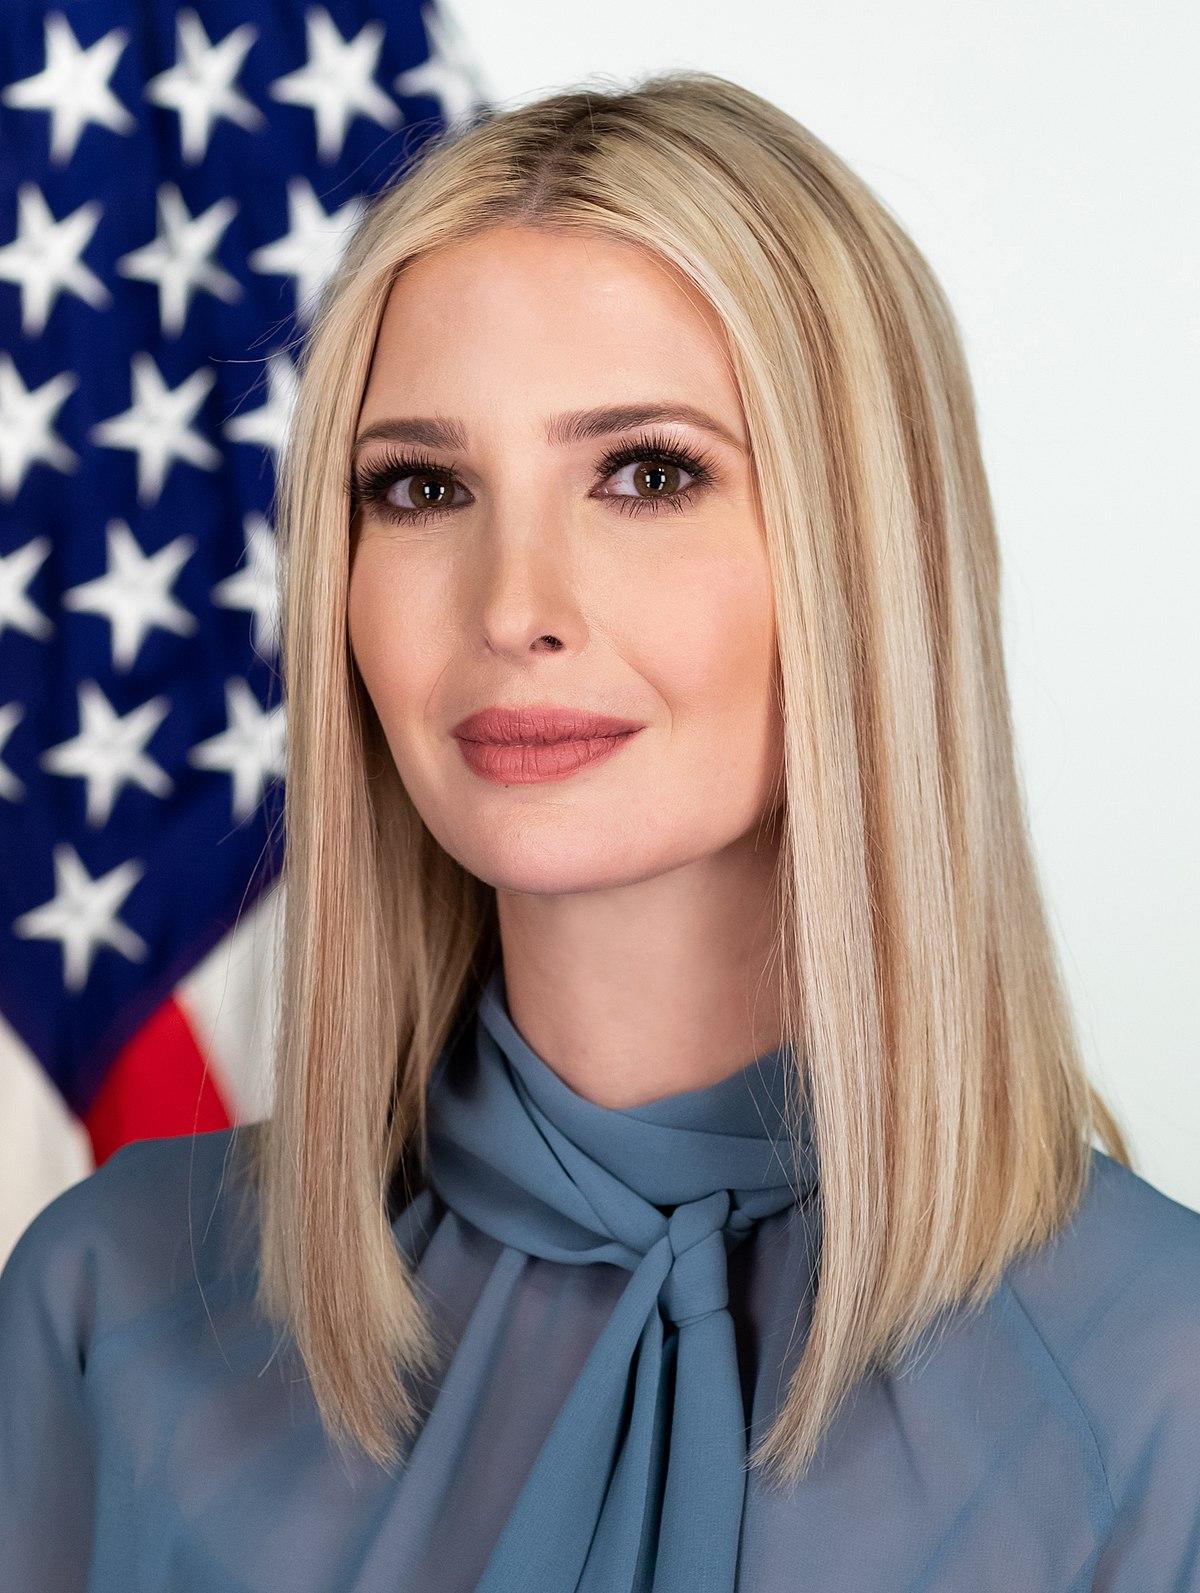 Ivanka Trump's physical appearance